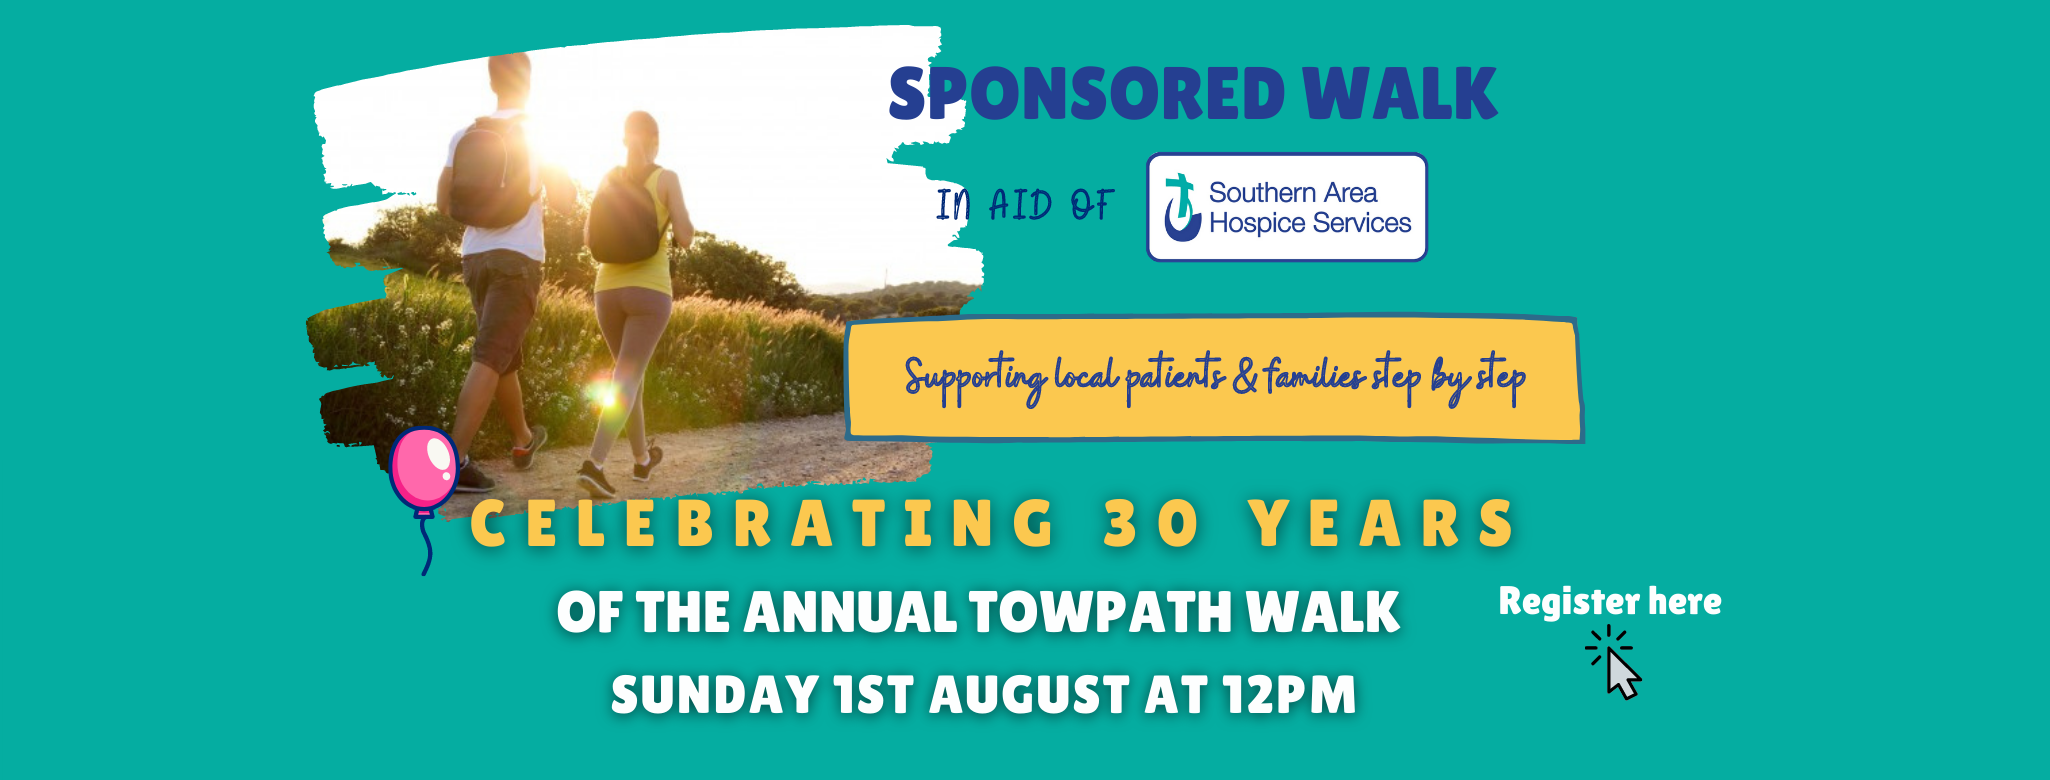 Towpath Walk